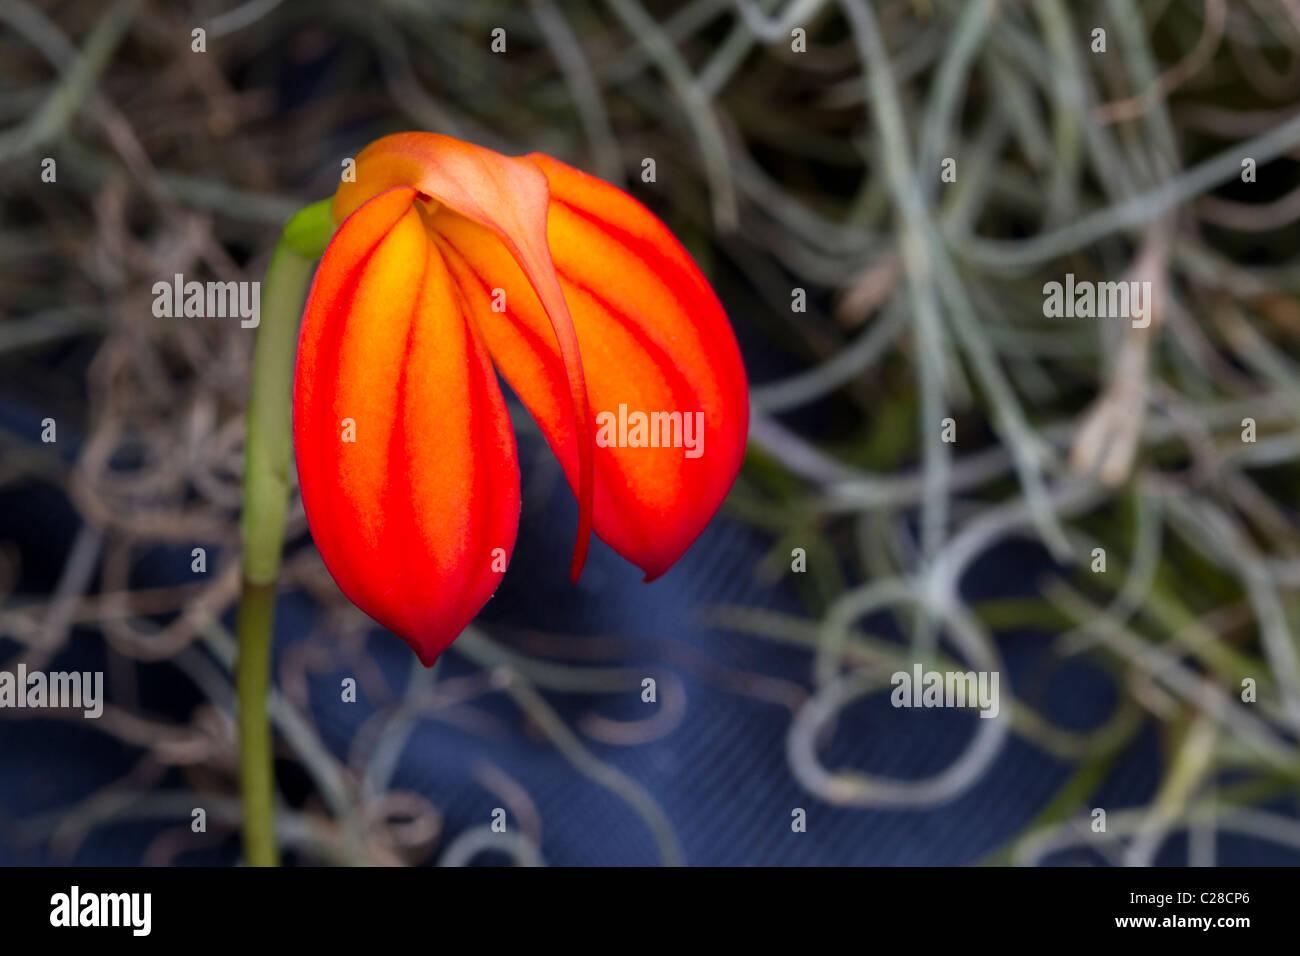 Red and orange orchid (Masdevallia ignea), a species native to Columbia. - Stock Image